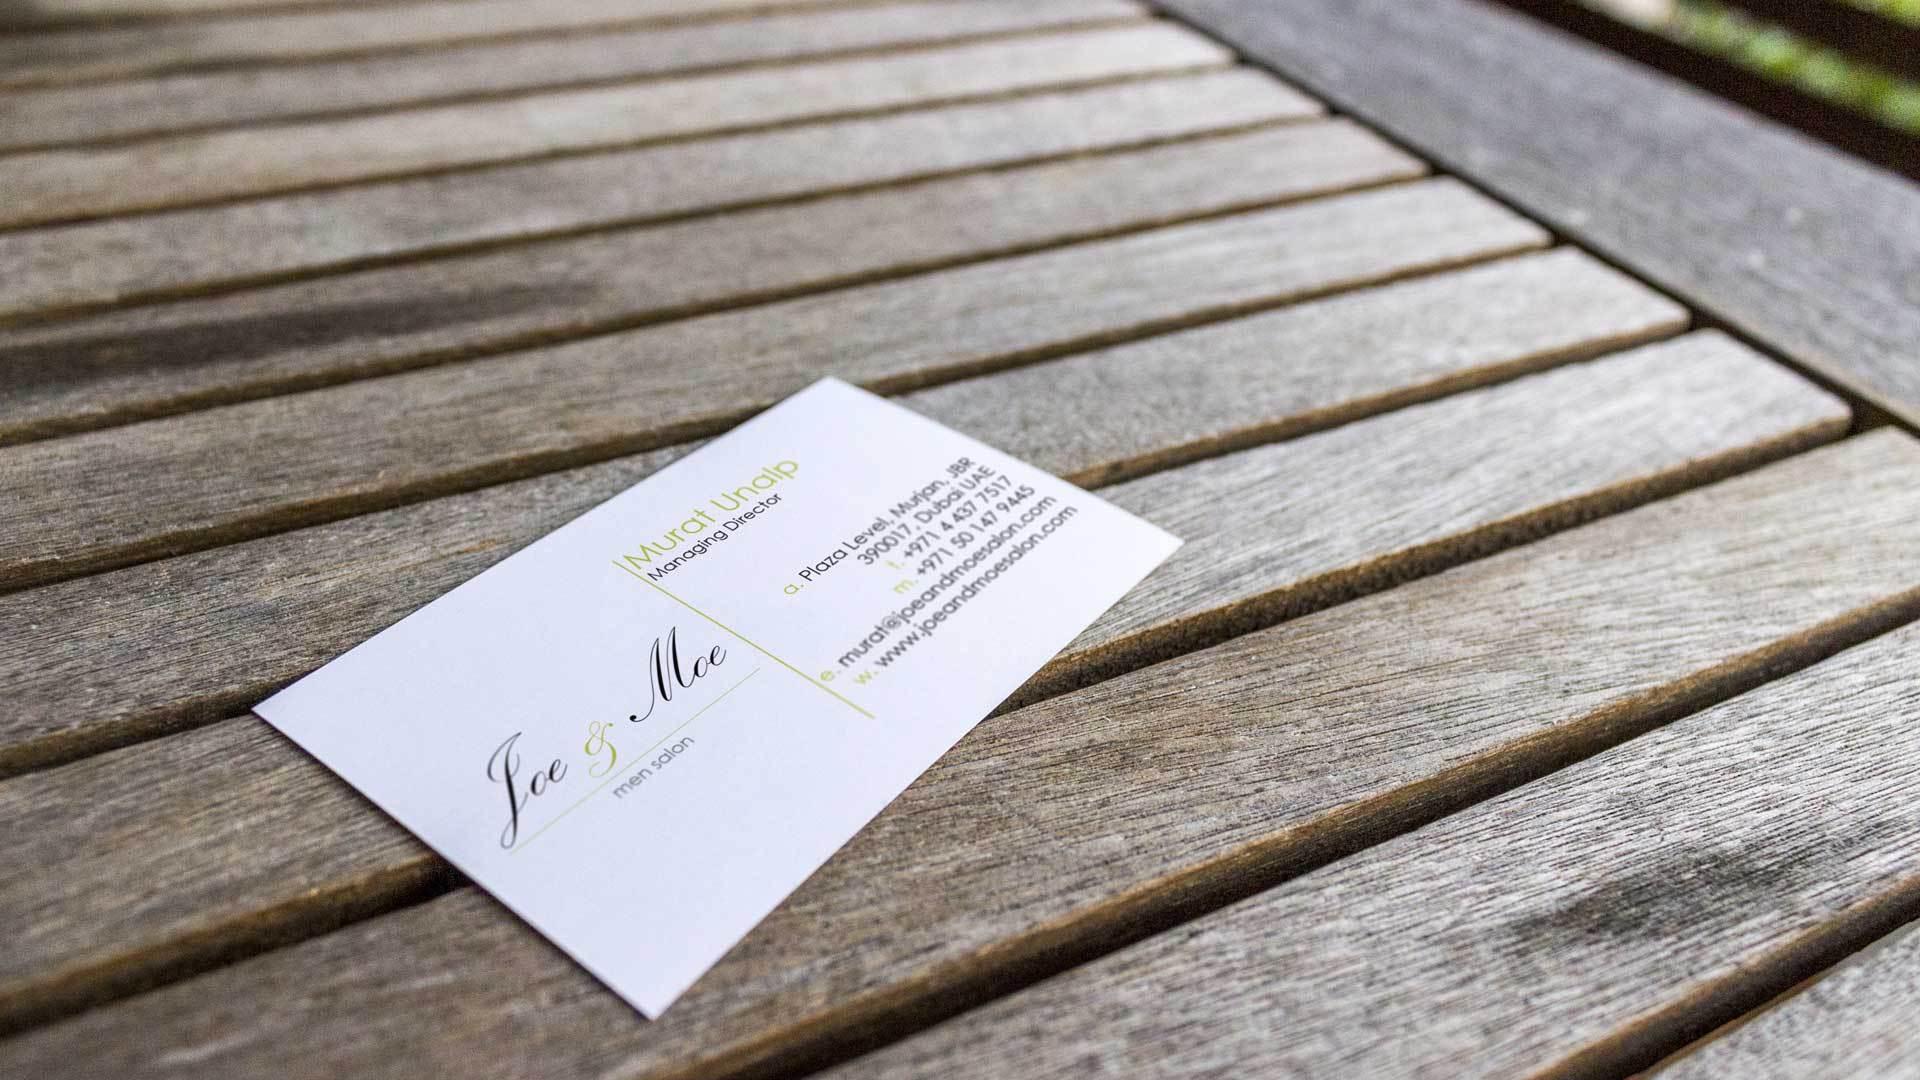 joe-moe-business-card